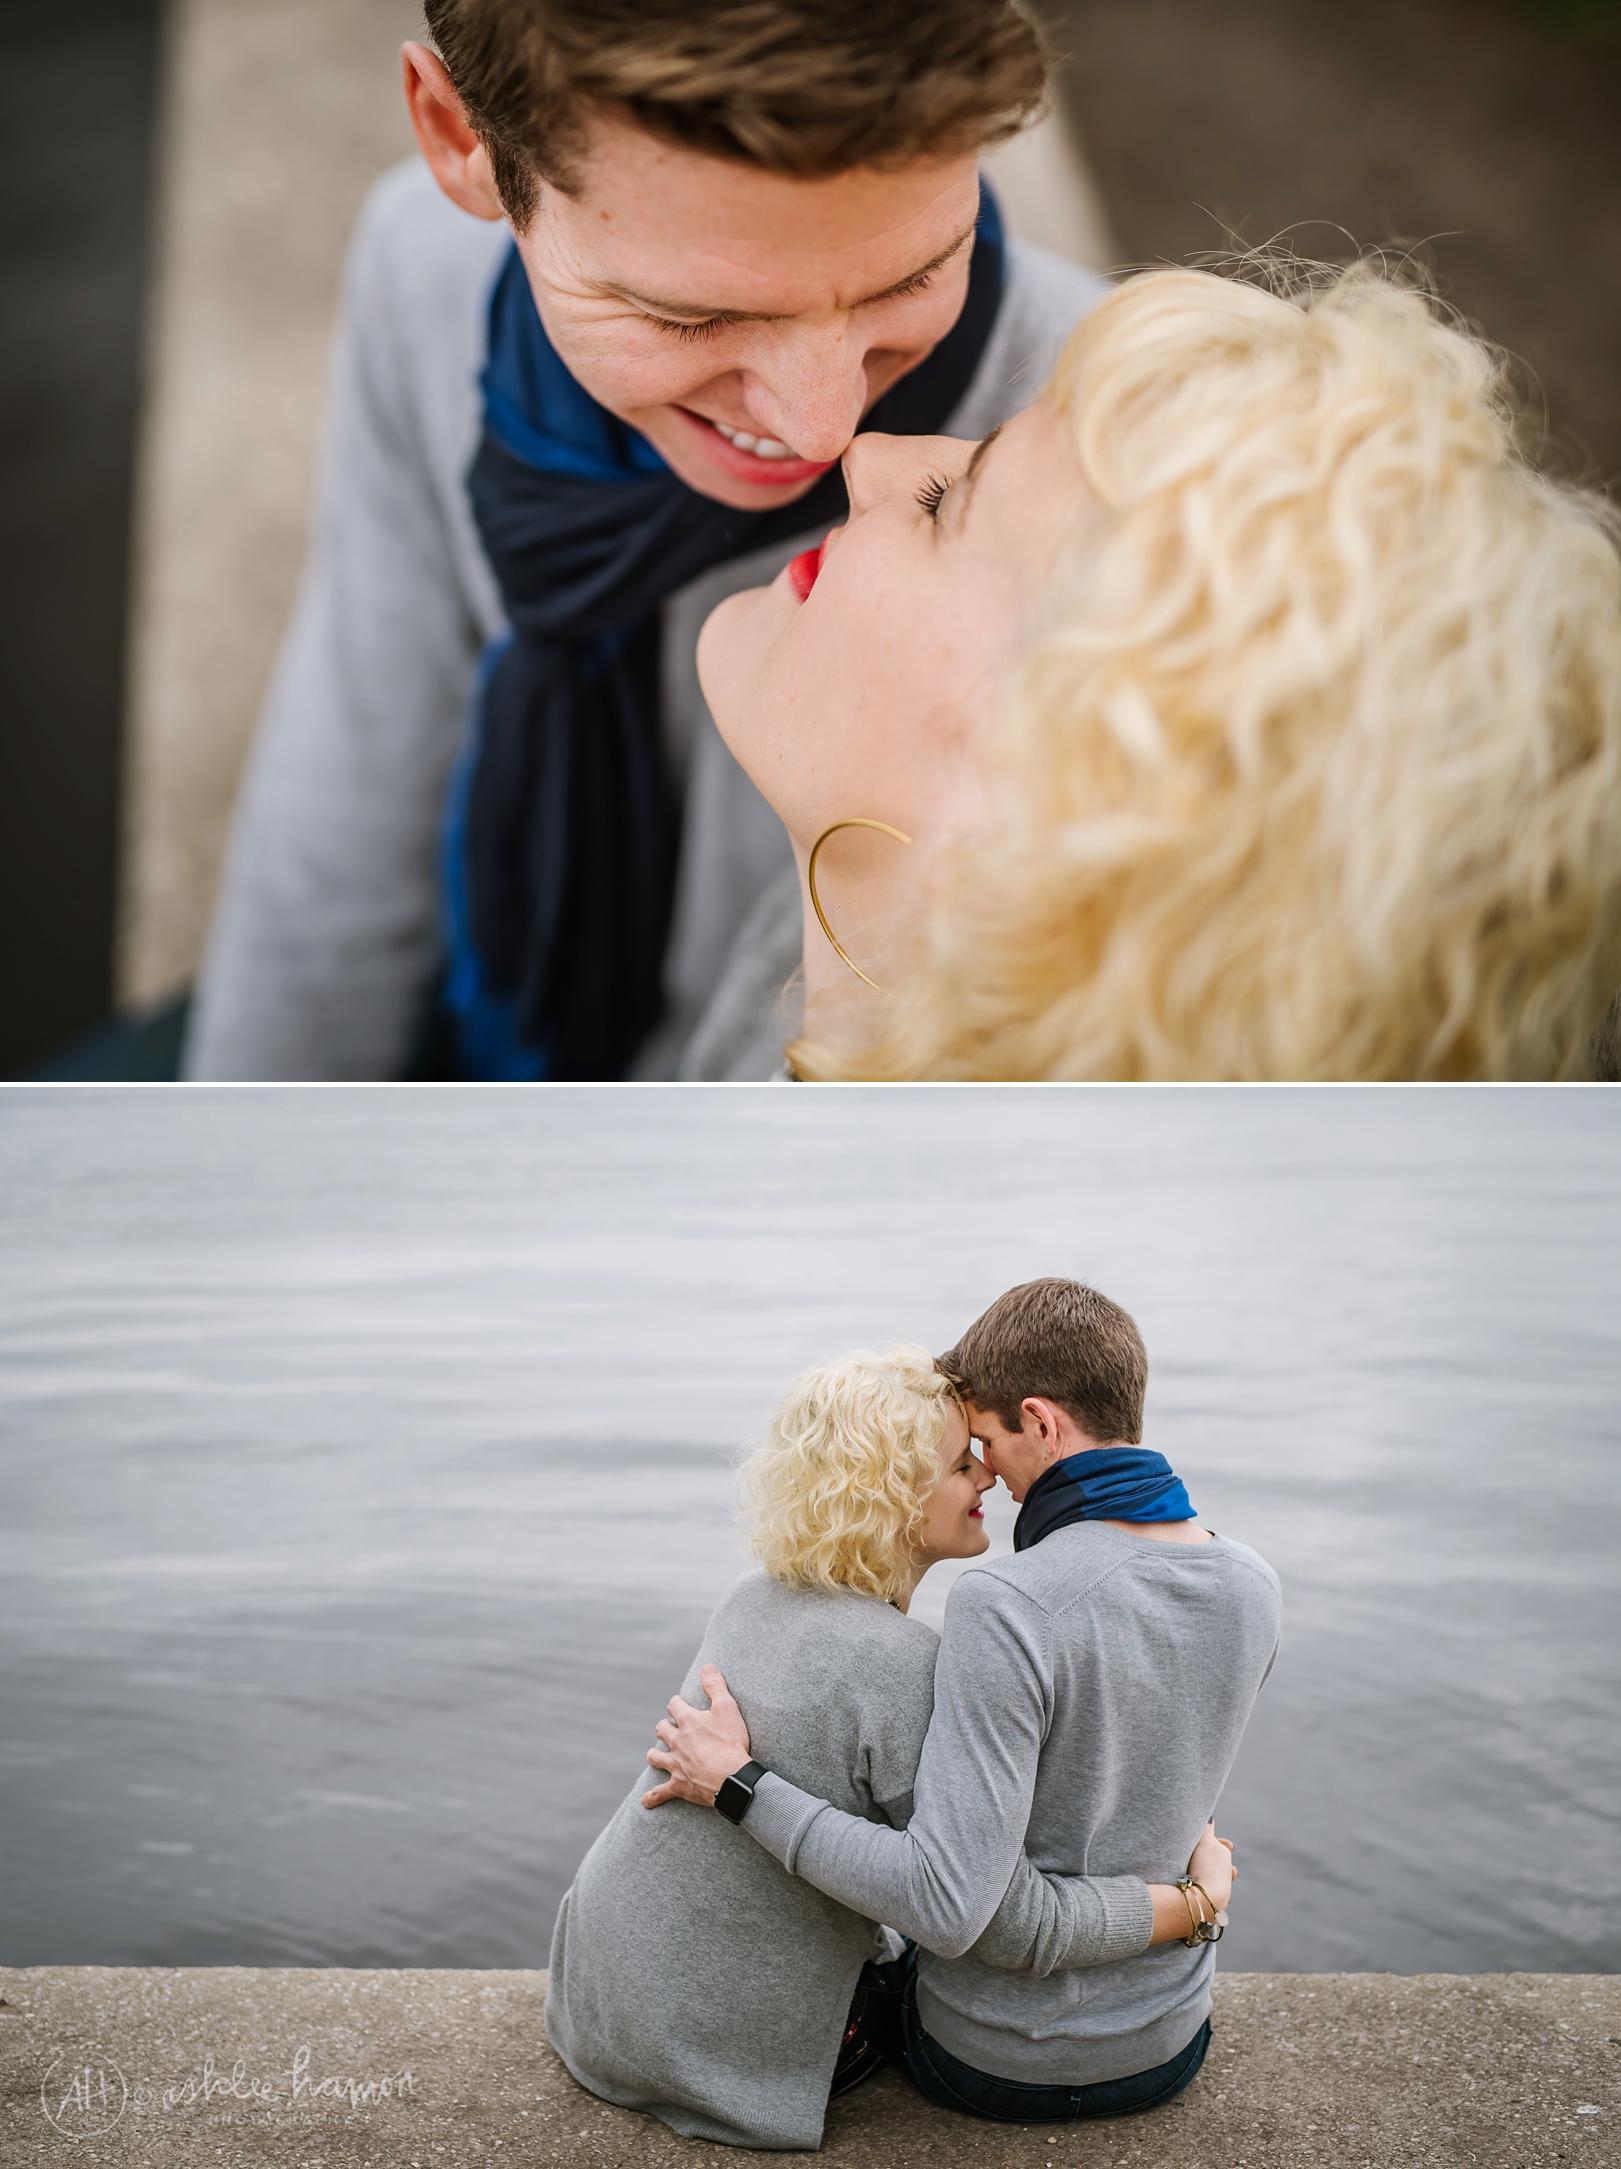 tampa-couple-photography-anniversary-photos-ashlee-hamon_0006.jpg